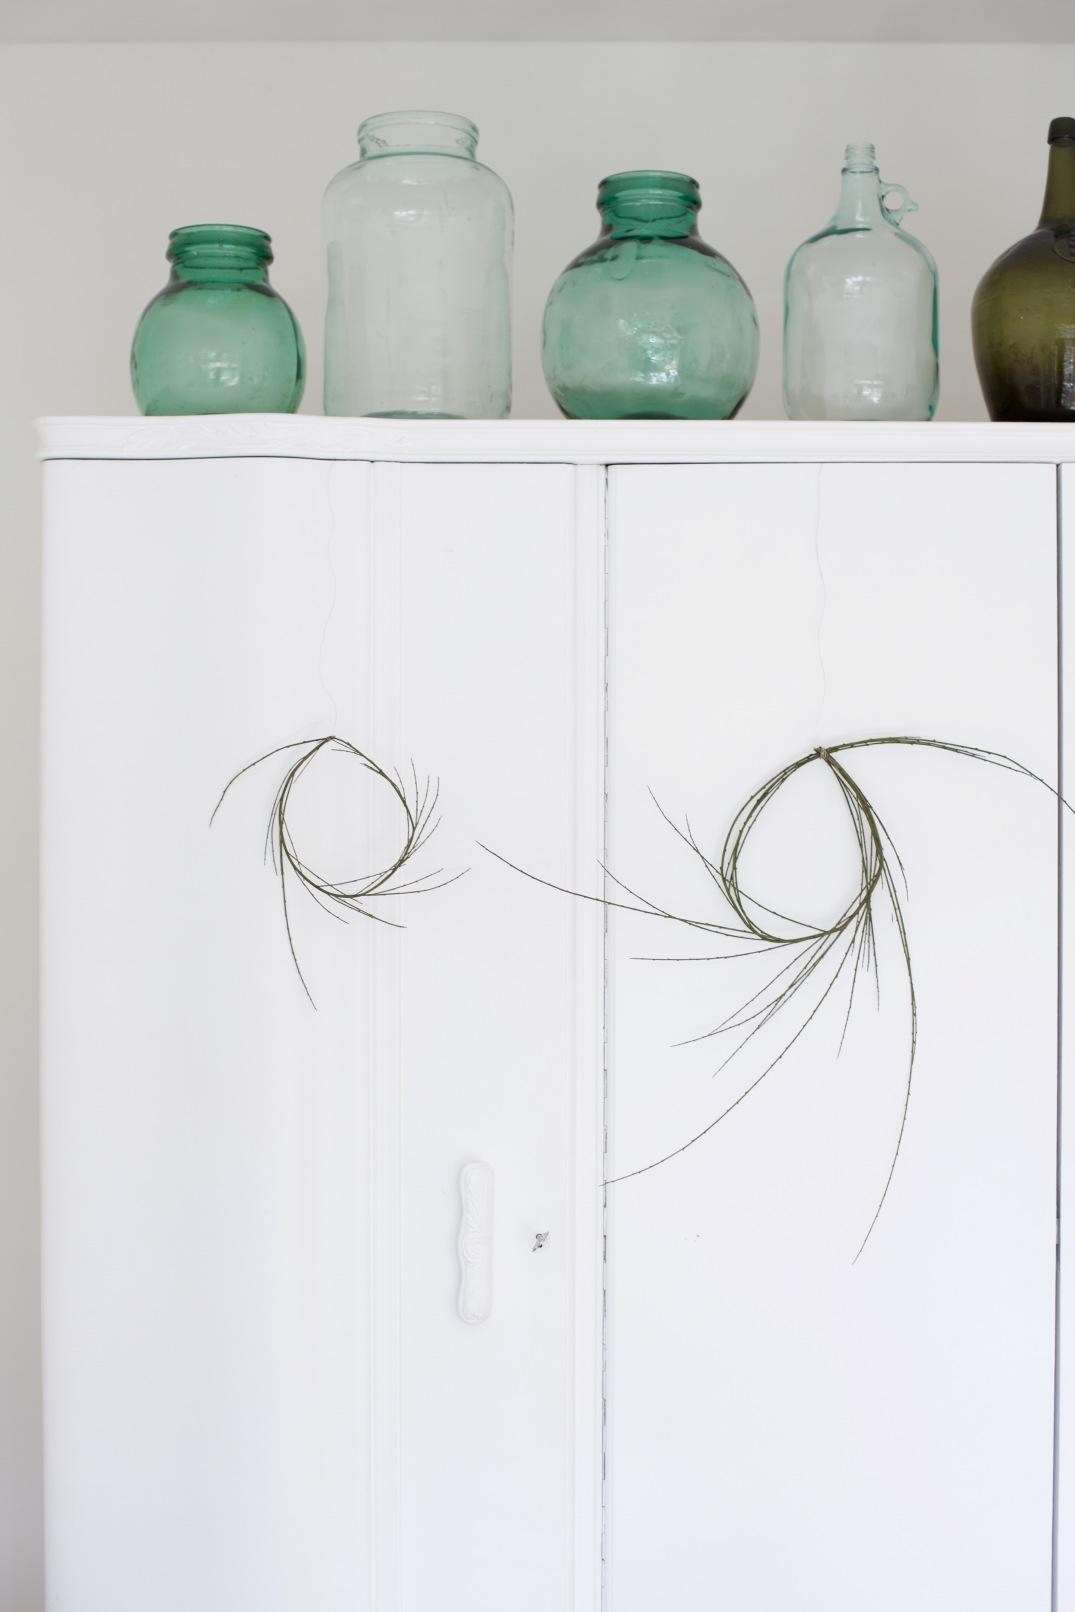 White bedroom, green vintage bottles & wreaths